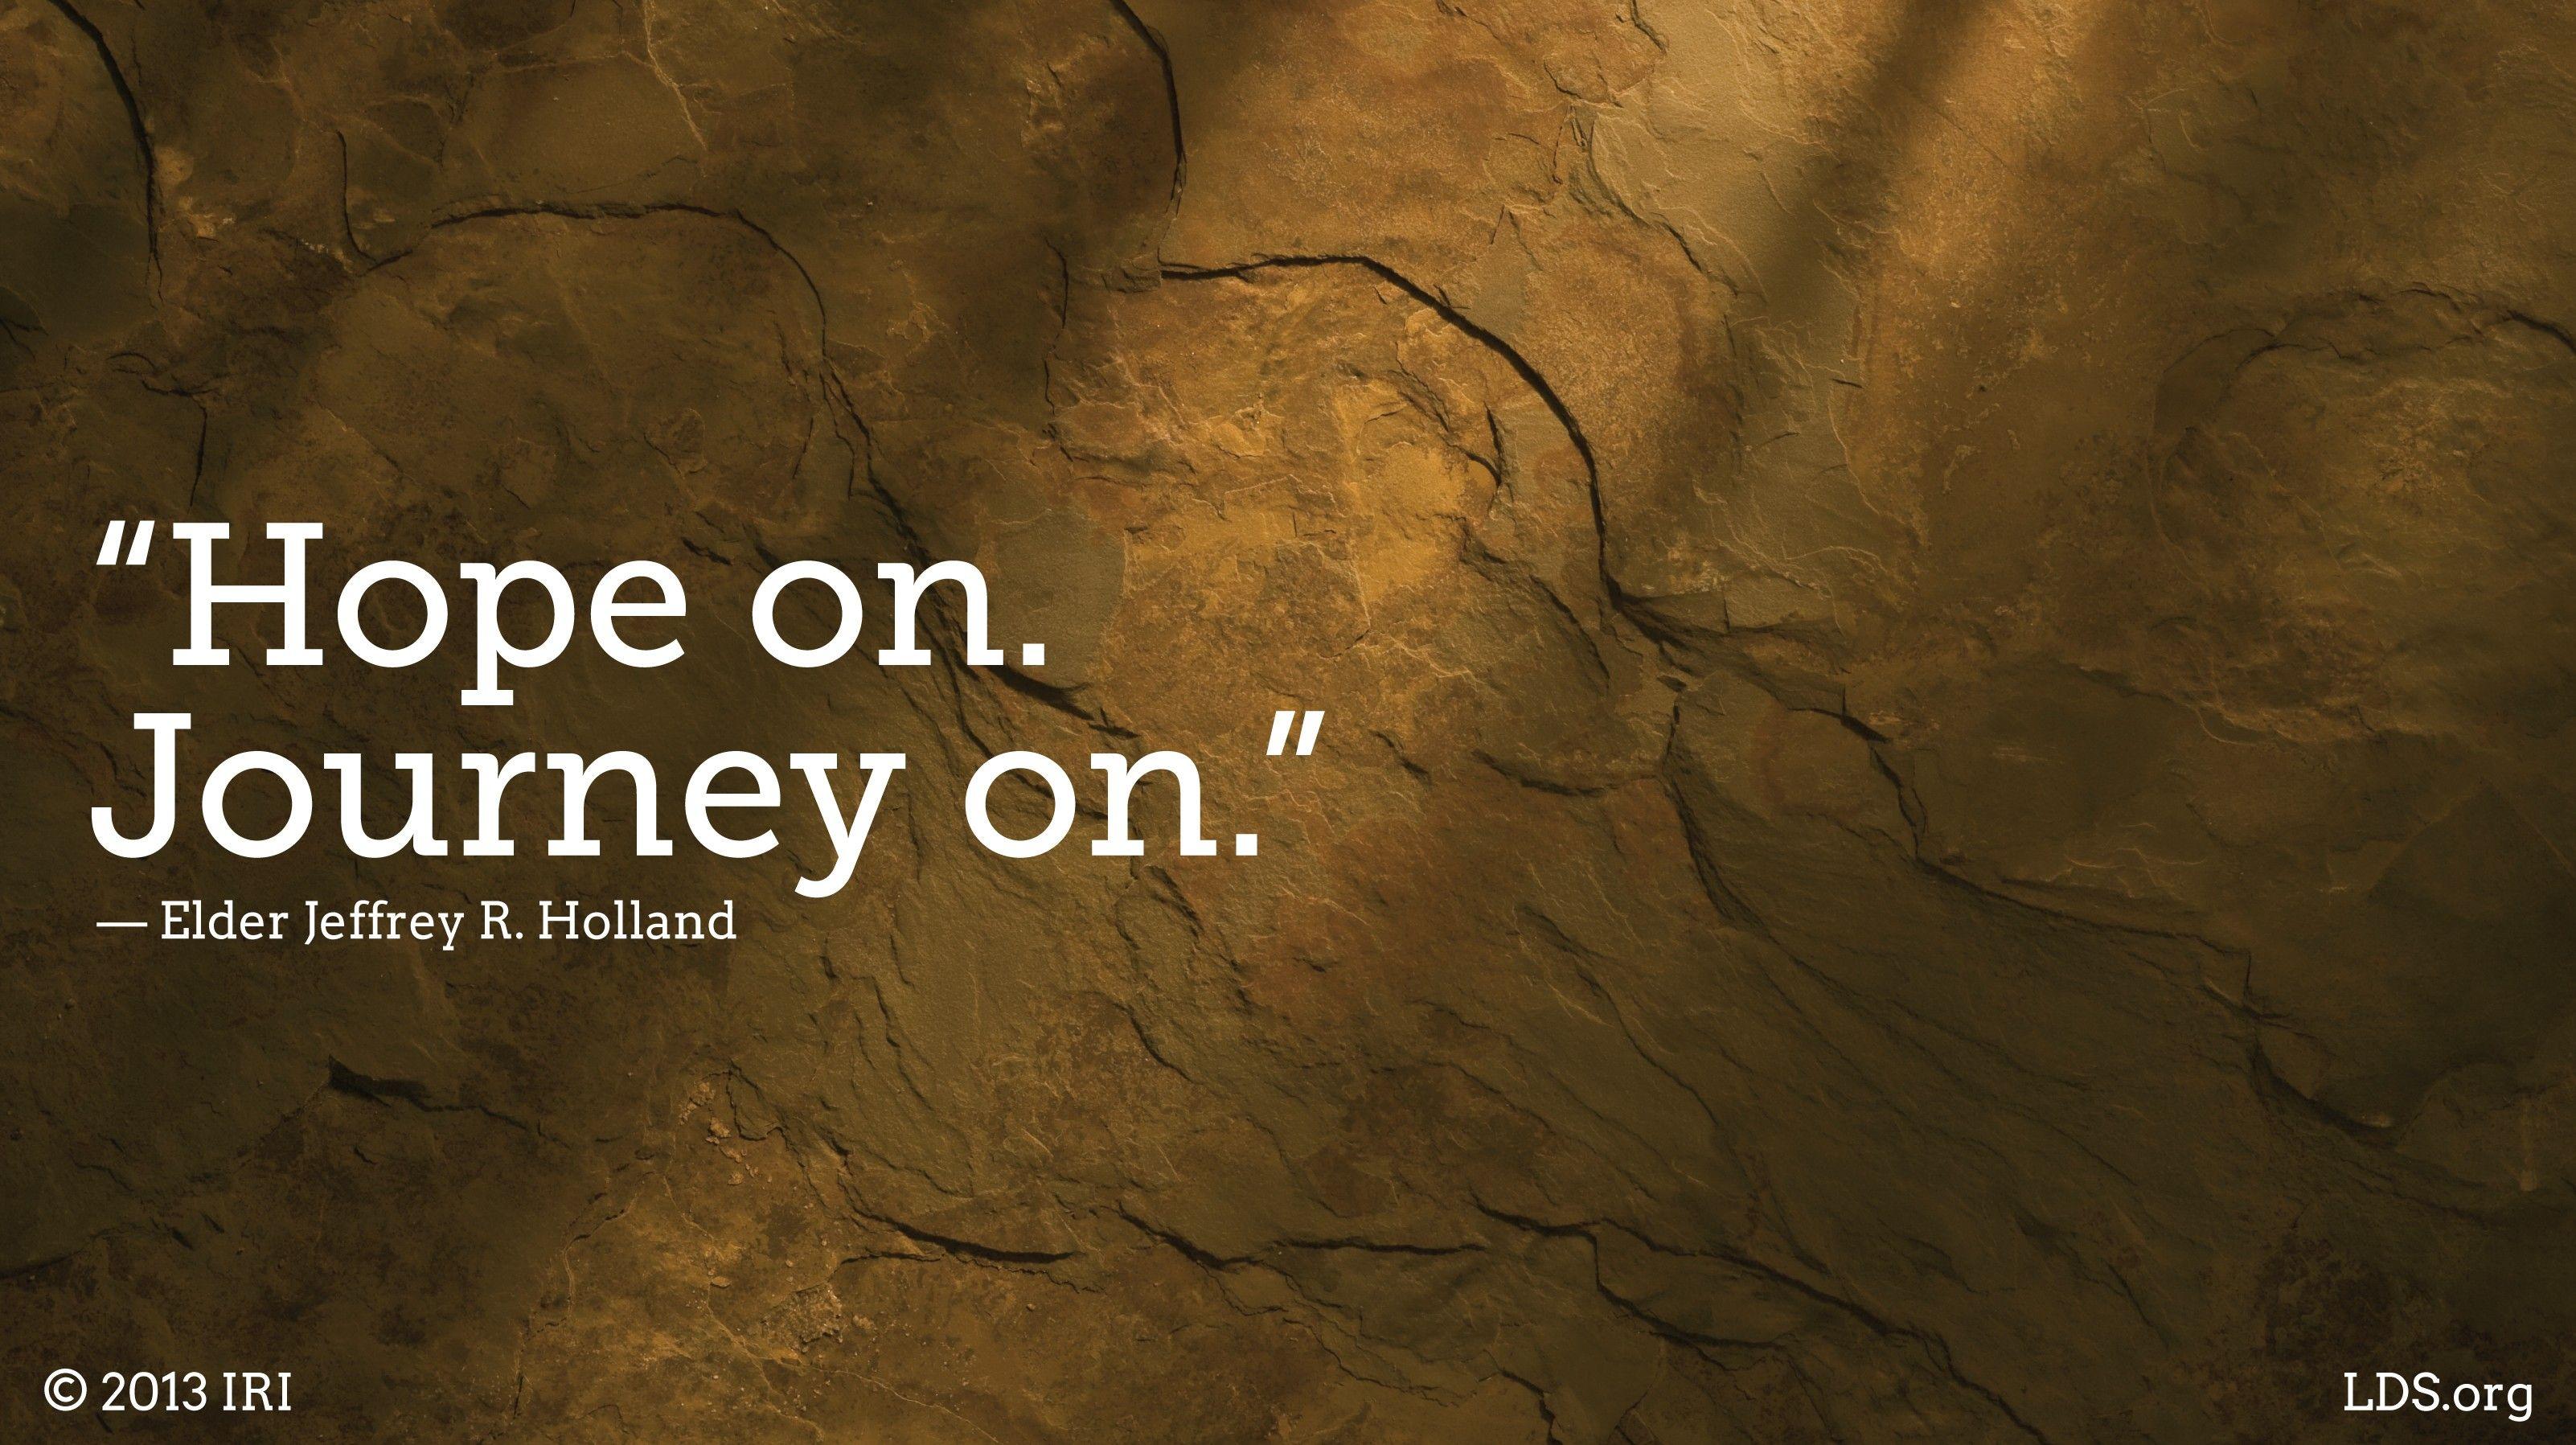 """Hope on. Journey on.""—Elder Jeffrey R. Holland, ""Lord, I Believe"""